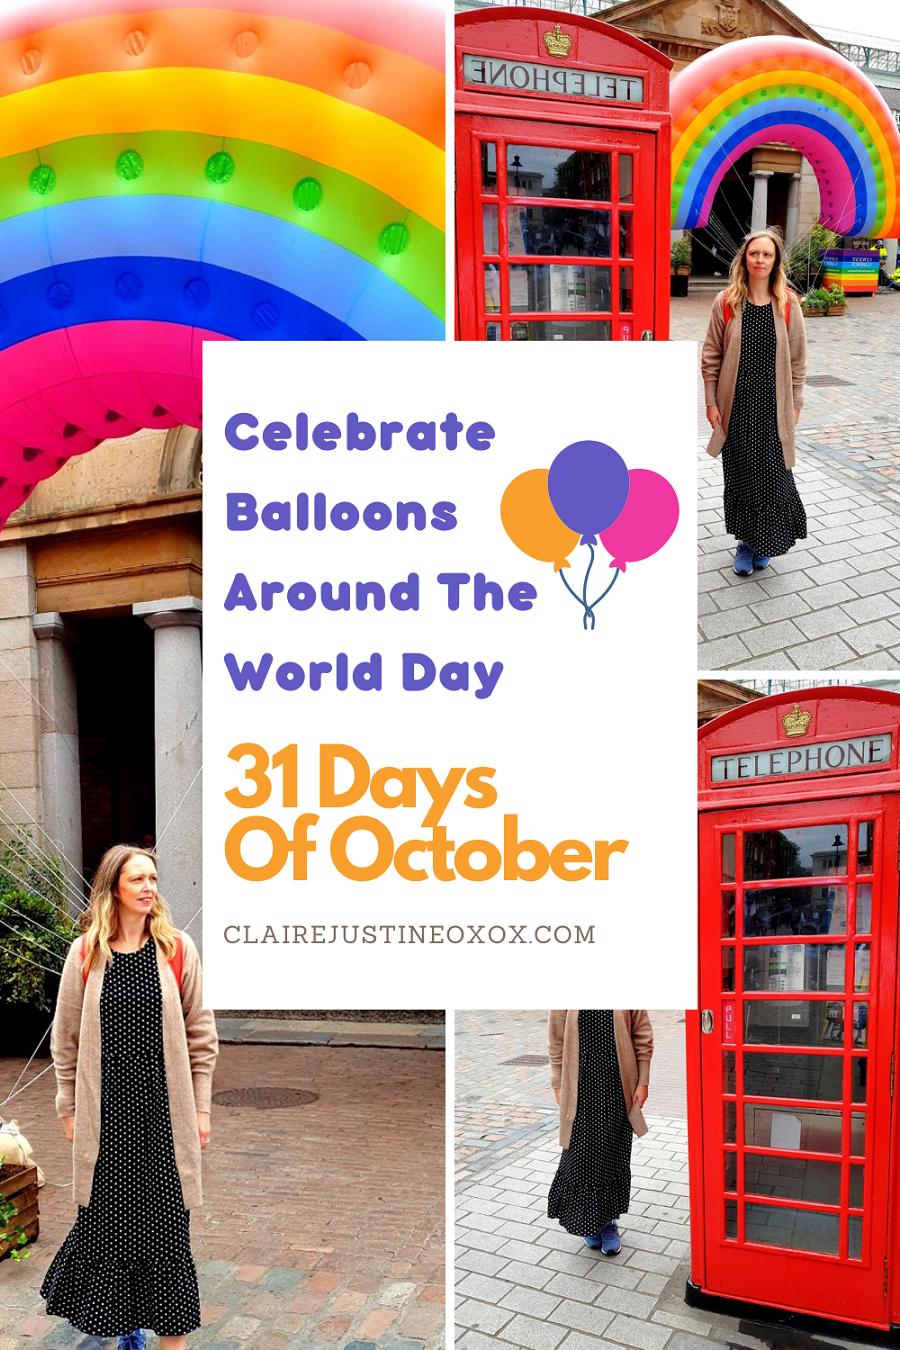 Happy Balloons Around The World Day